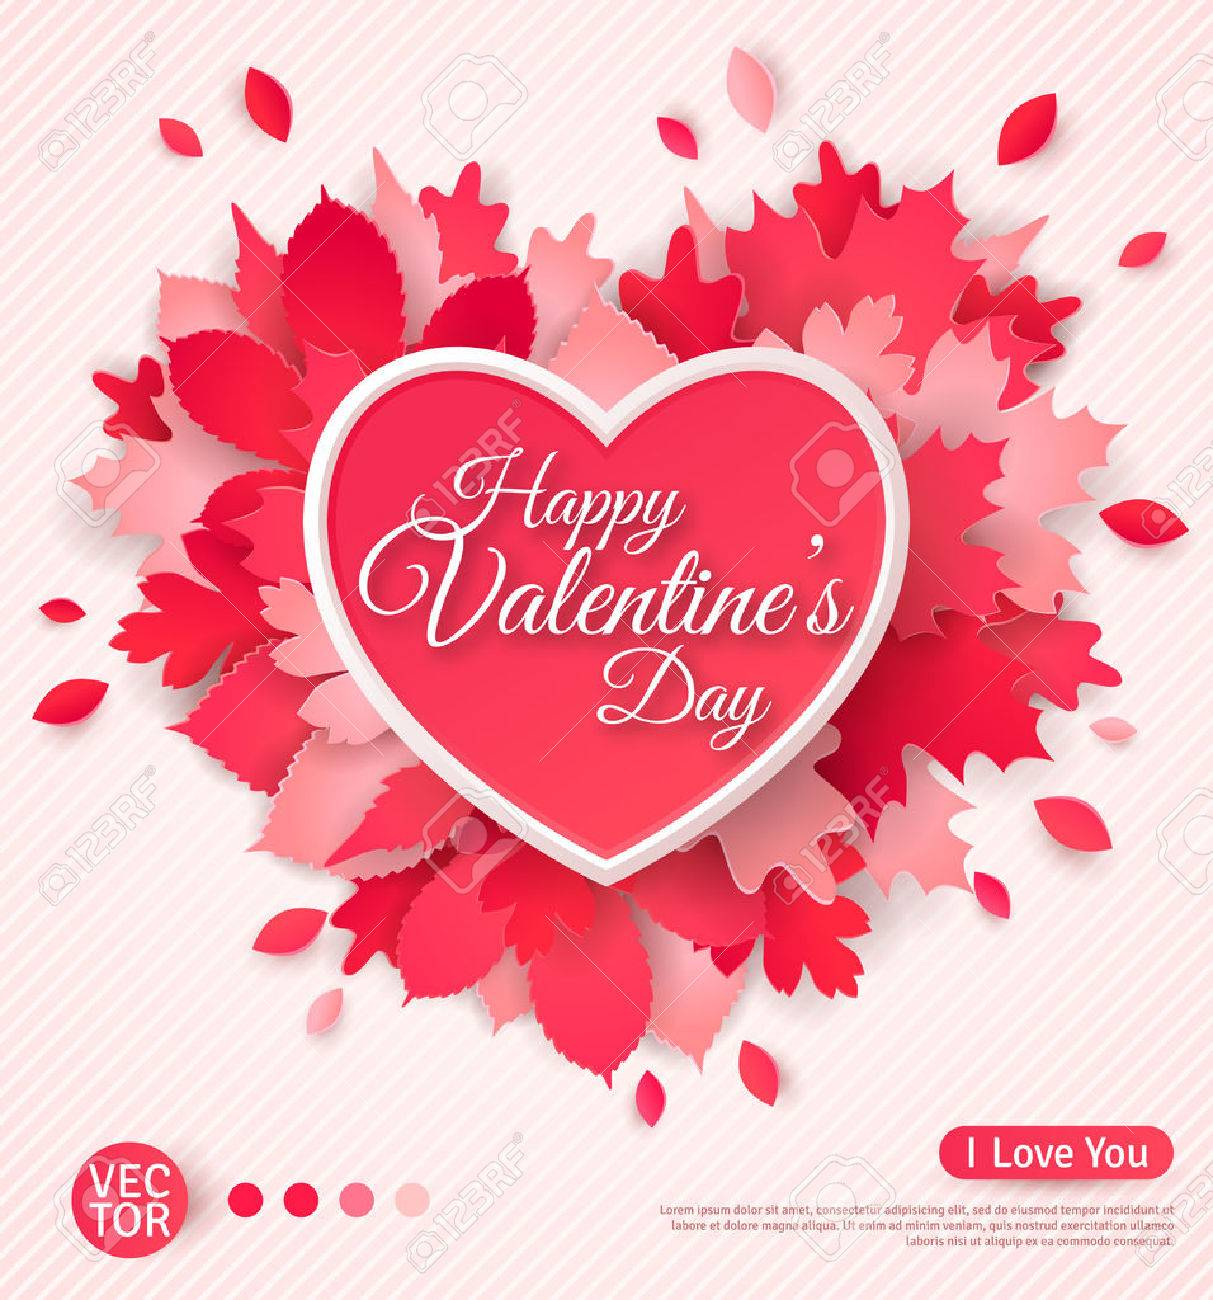 100 123 valentine cards boxed valentine cards promotion sho